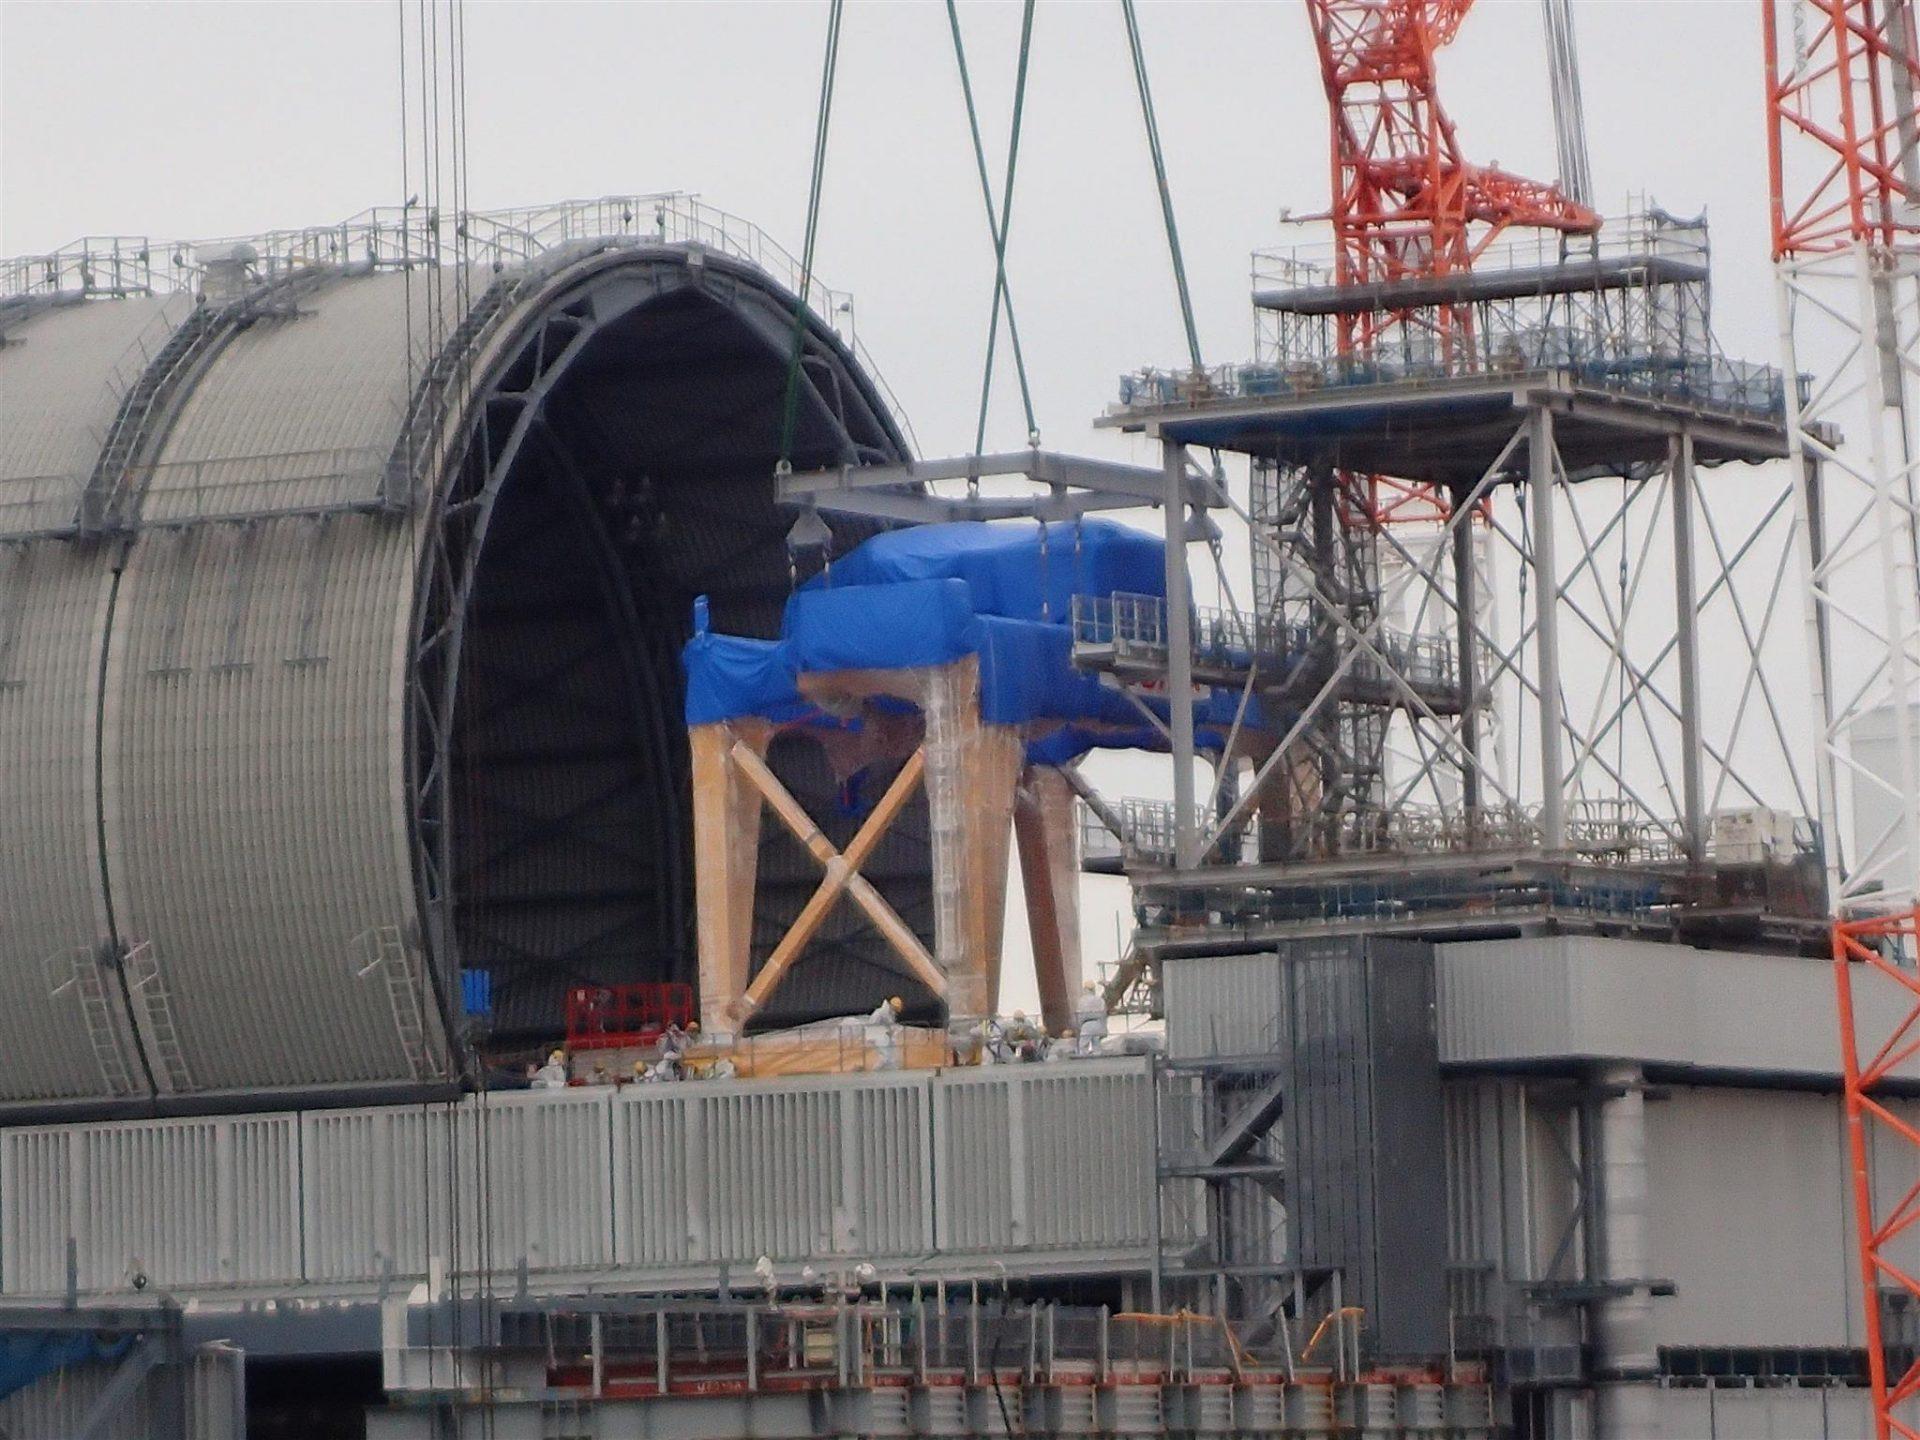 Fukushima Daiichi Status Updates